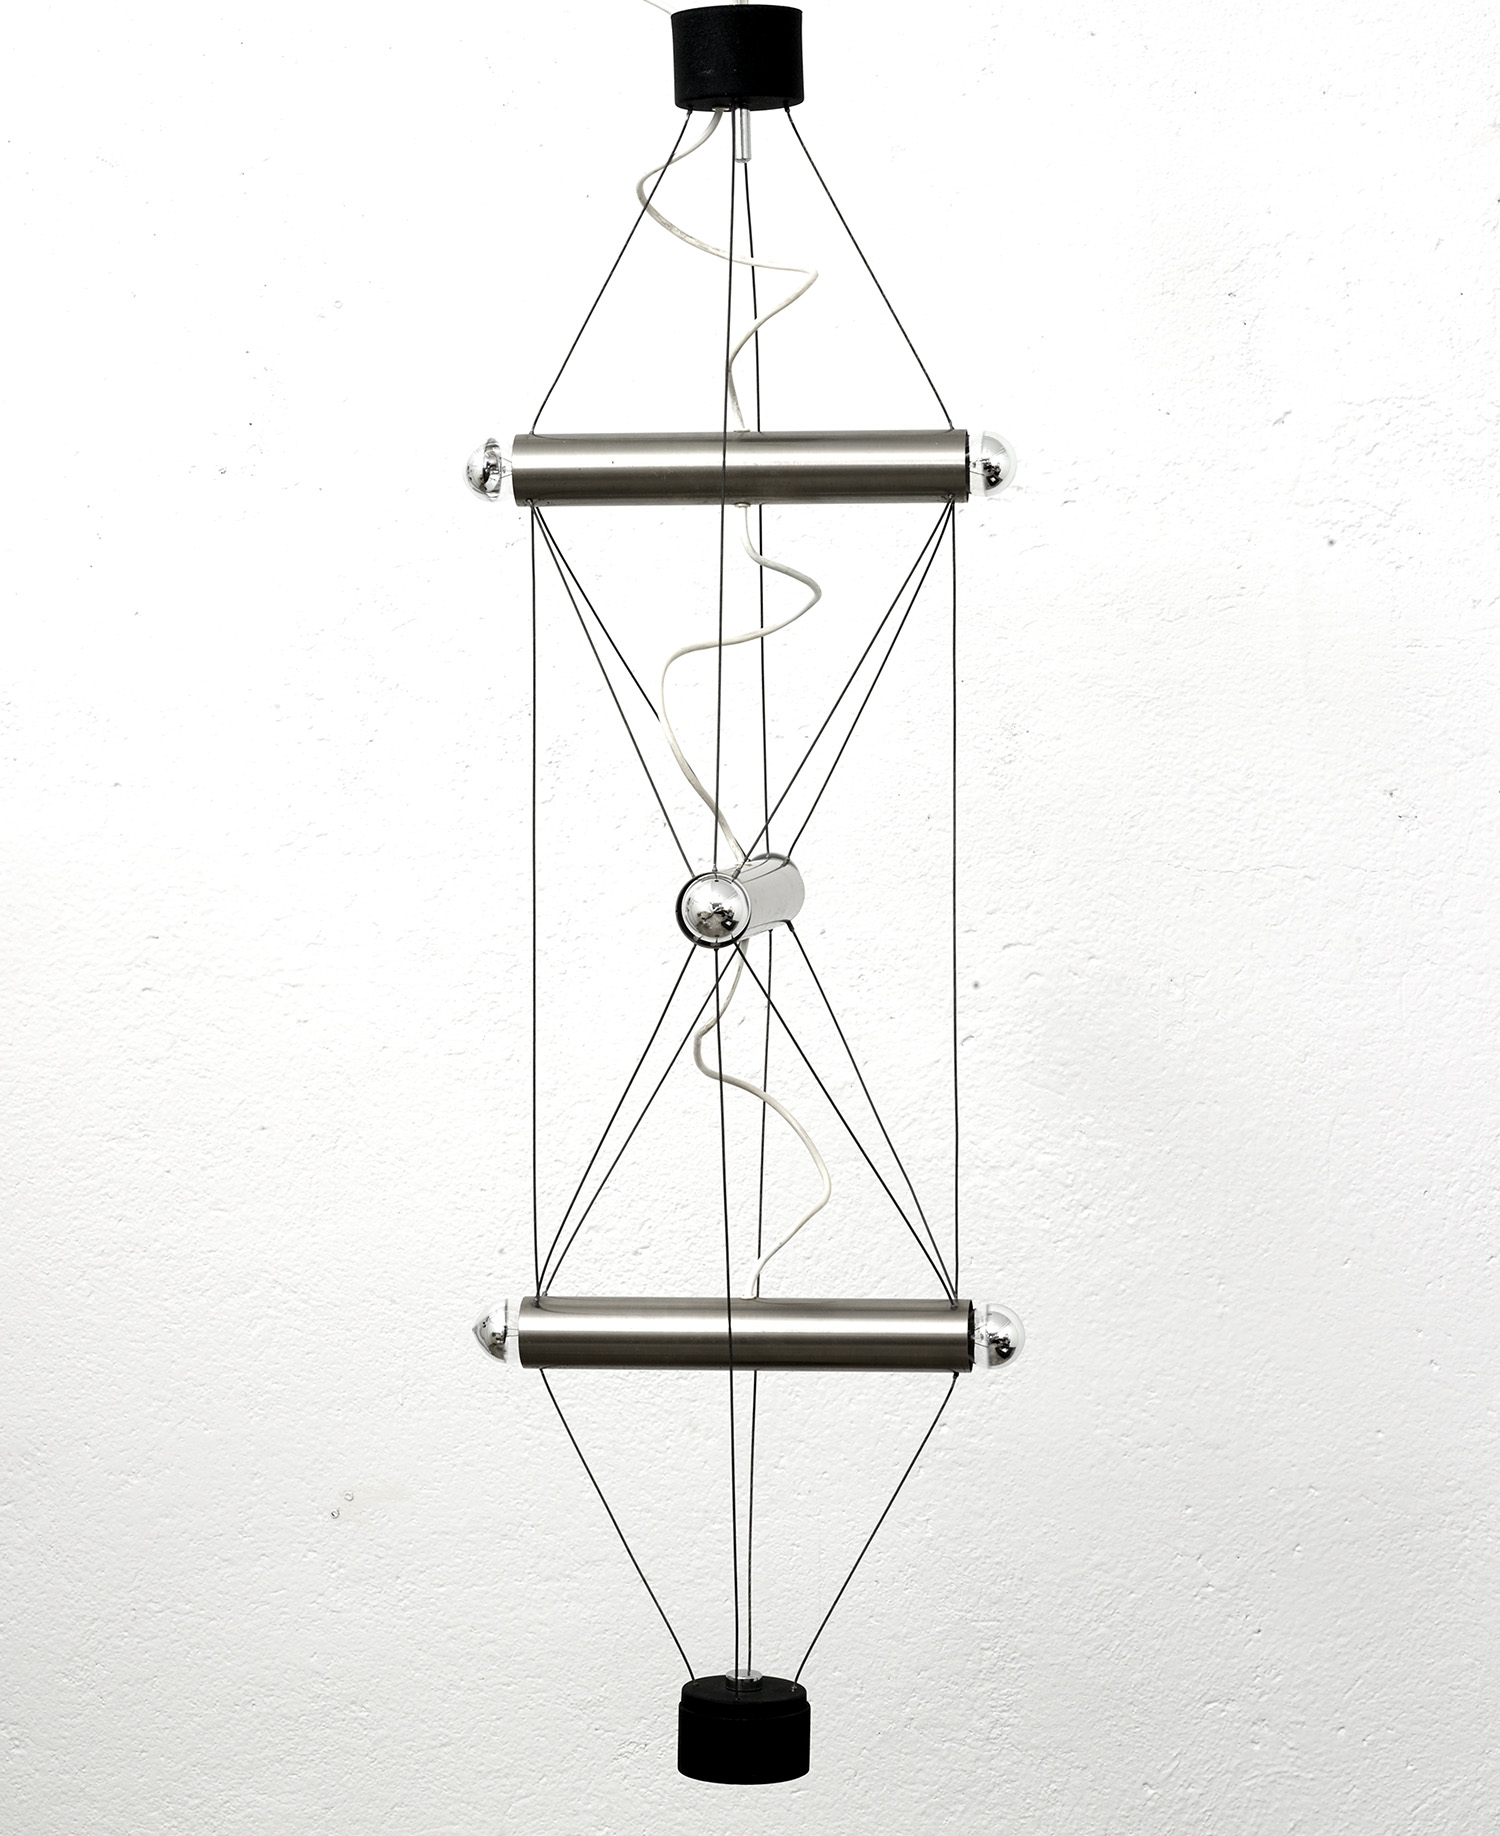 suspension-by-lumi-1970-image-01